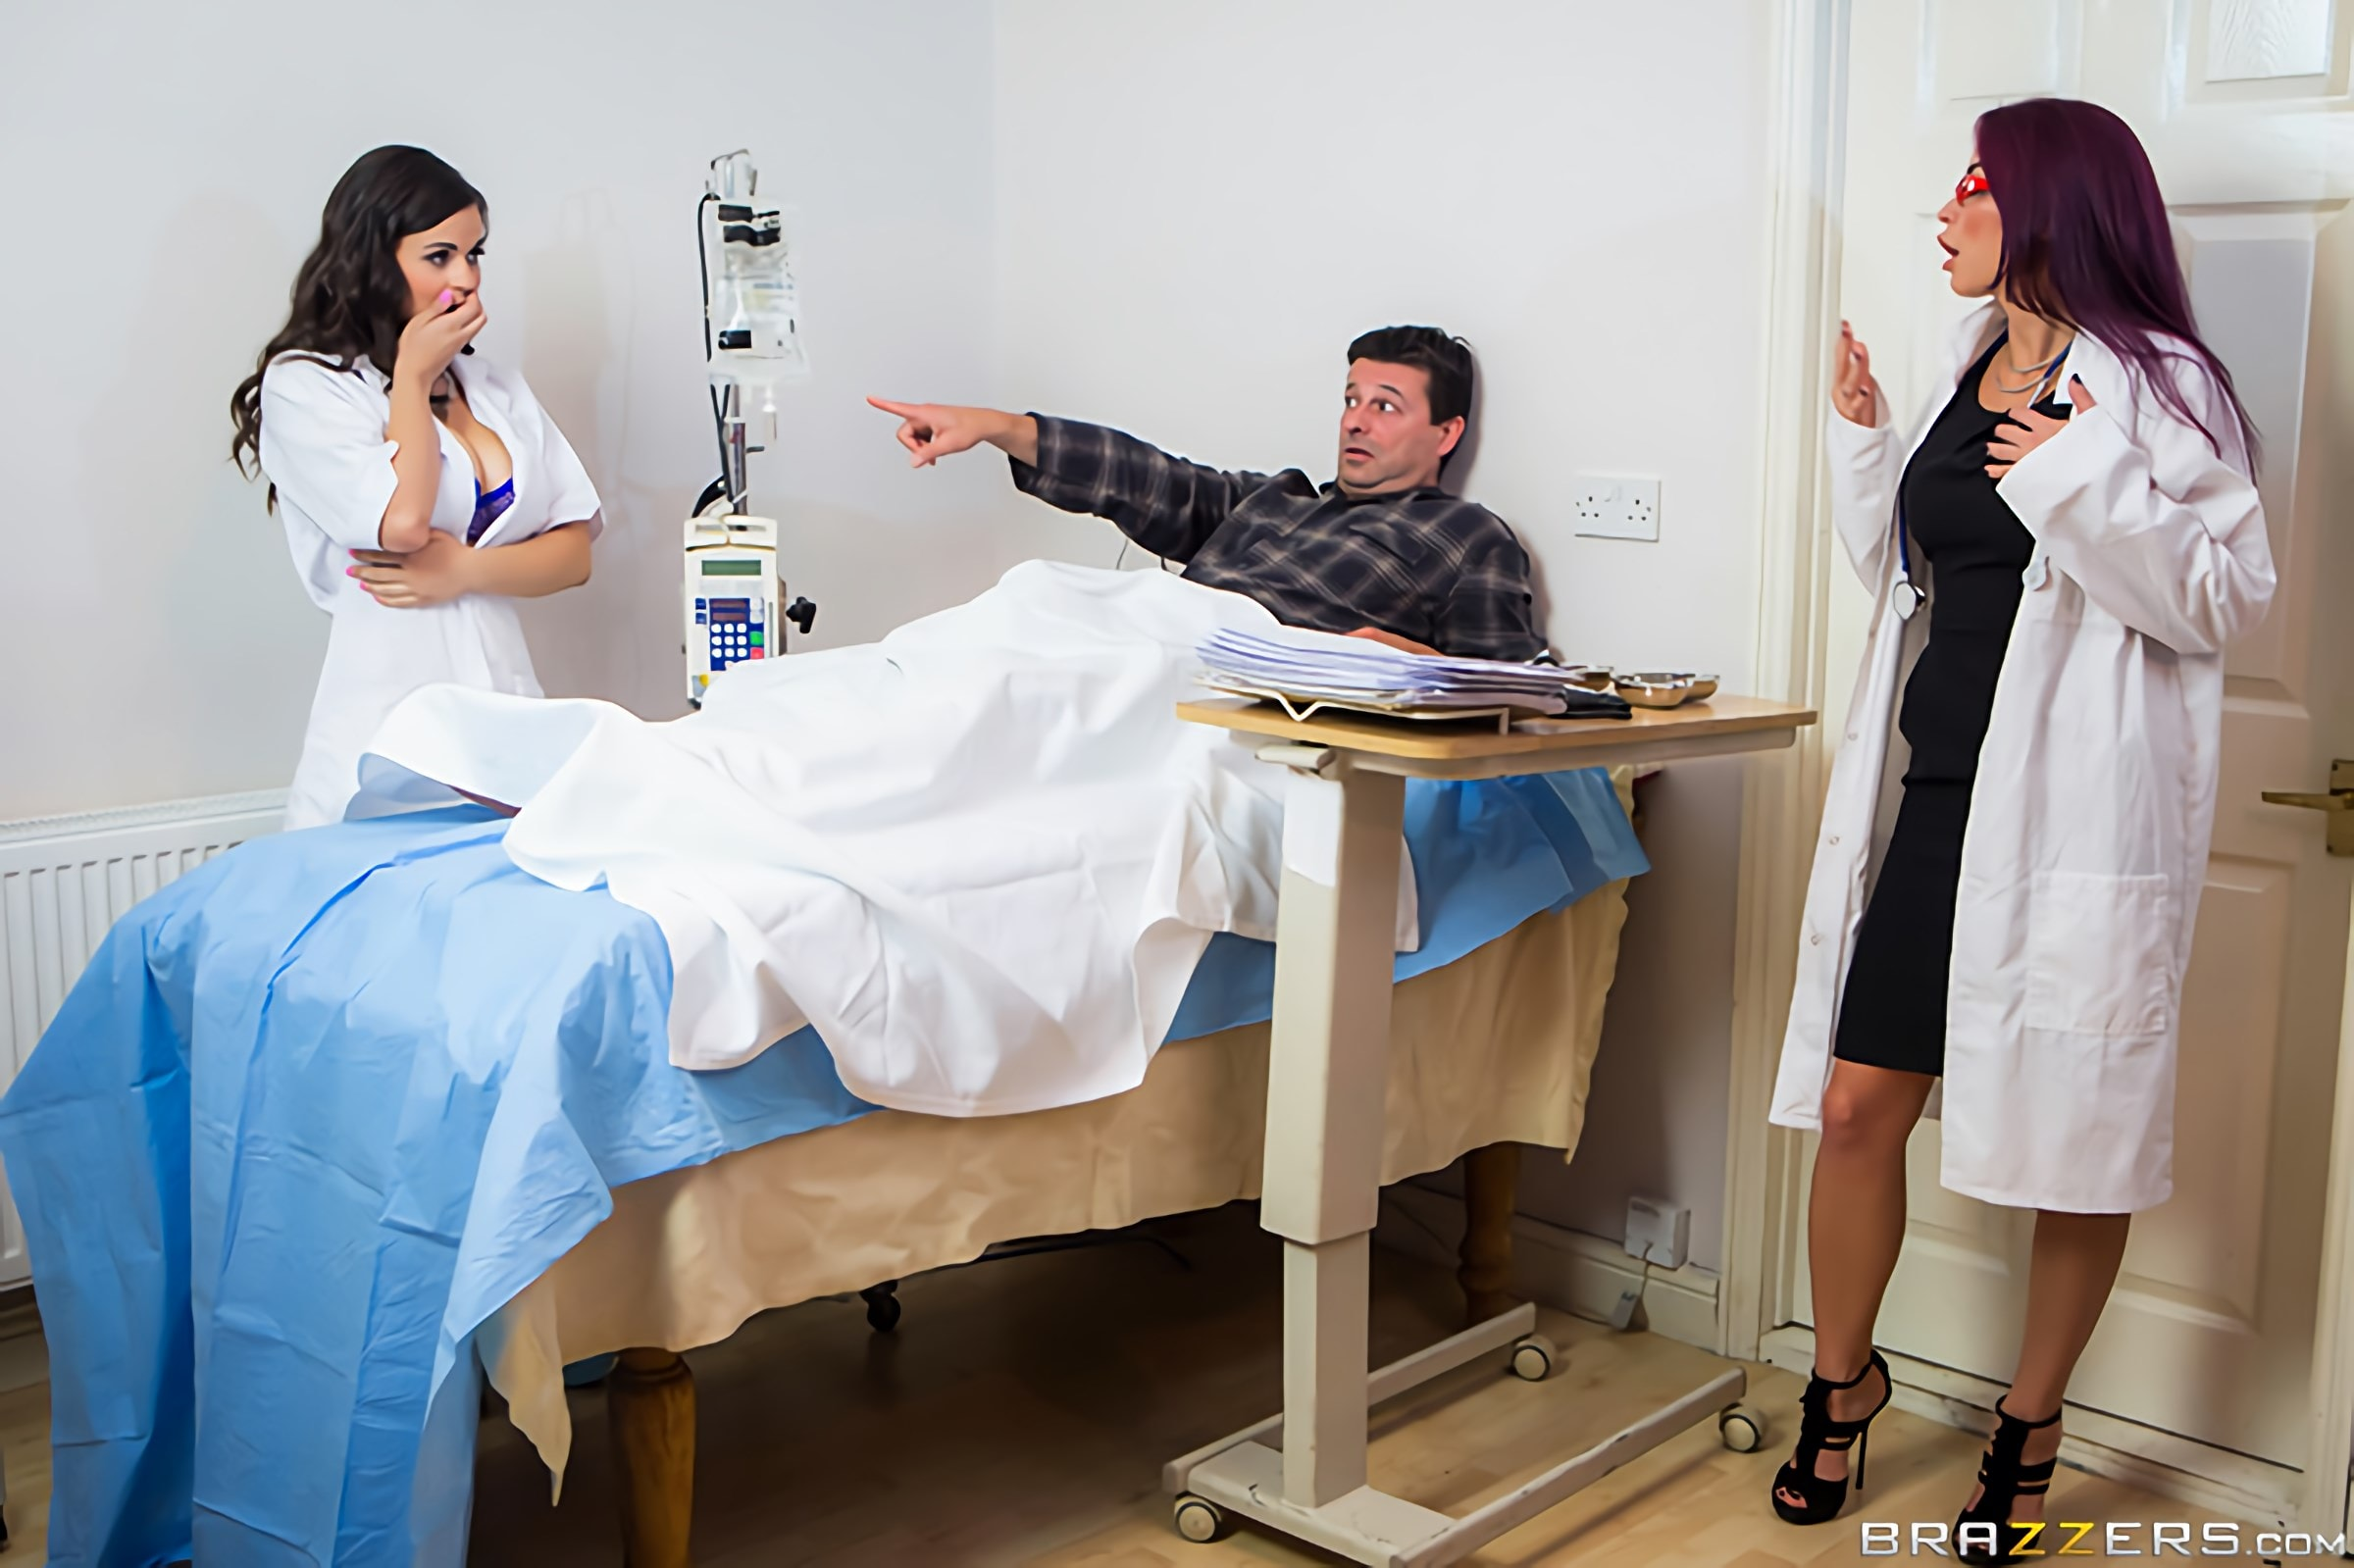 Brazzers 'Going HAM On The Nurse' starring Monique Alexander (Photo 1)